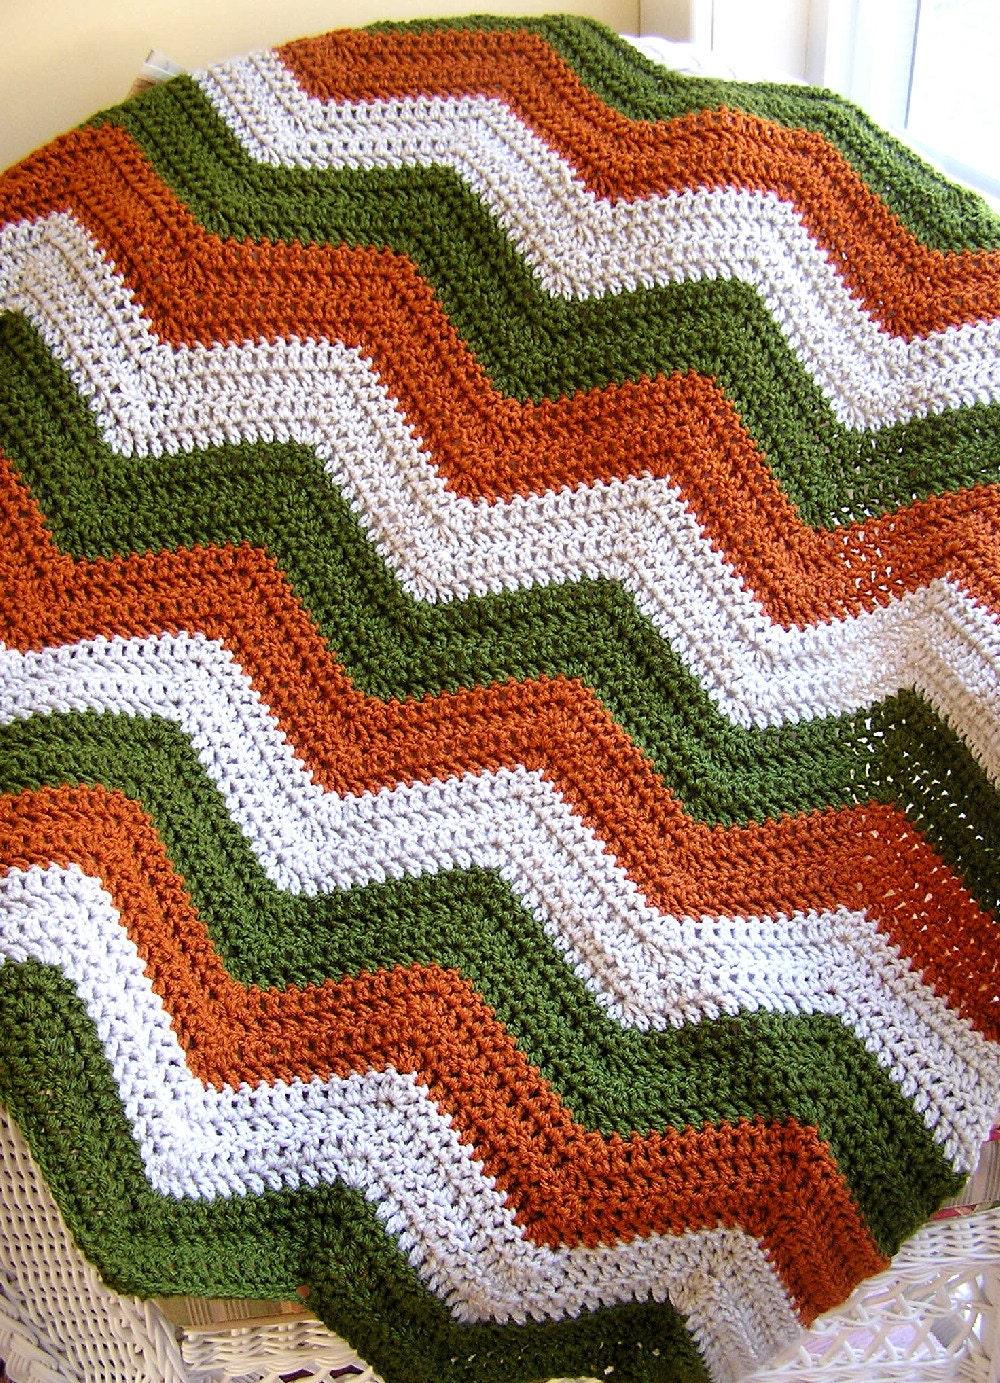 neue Chevron Zick Zack Baby Decke afghanische wickeln häkeln